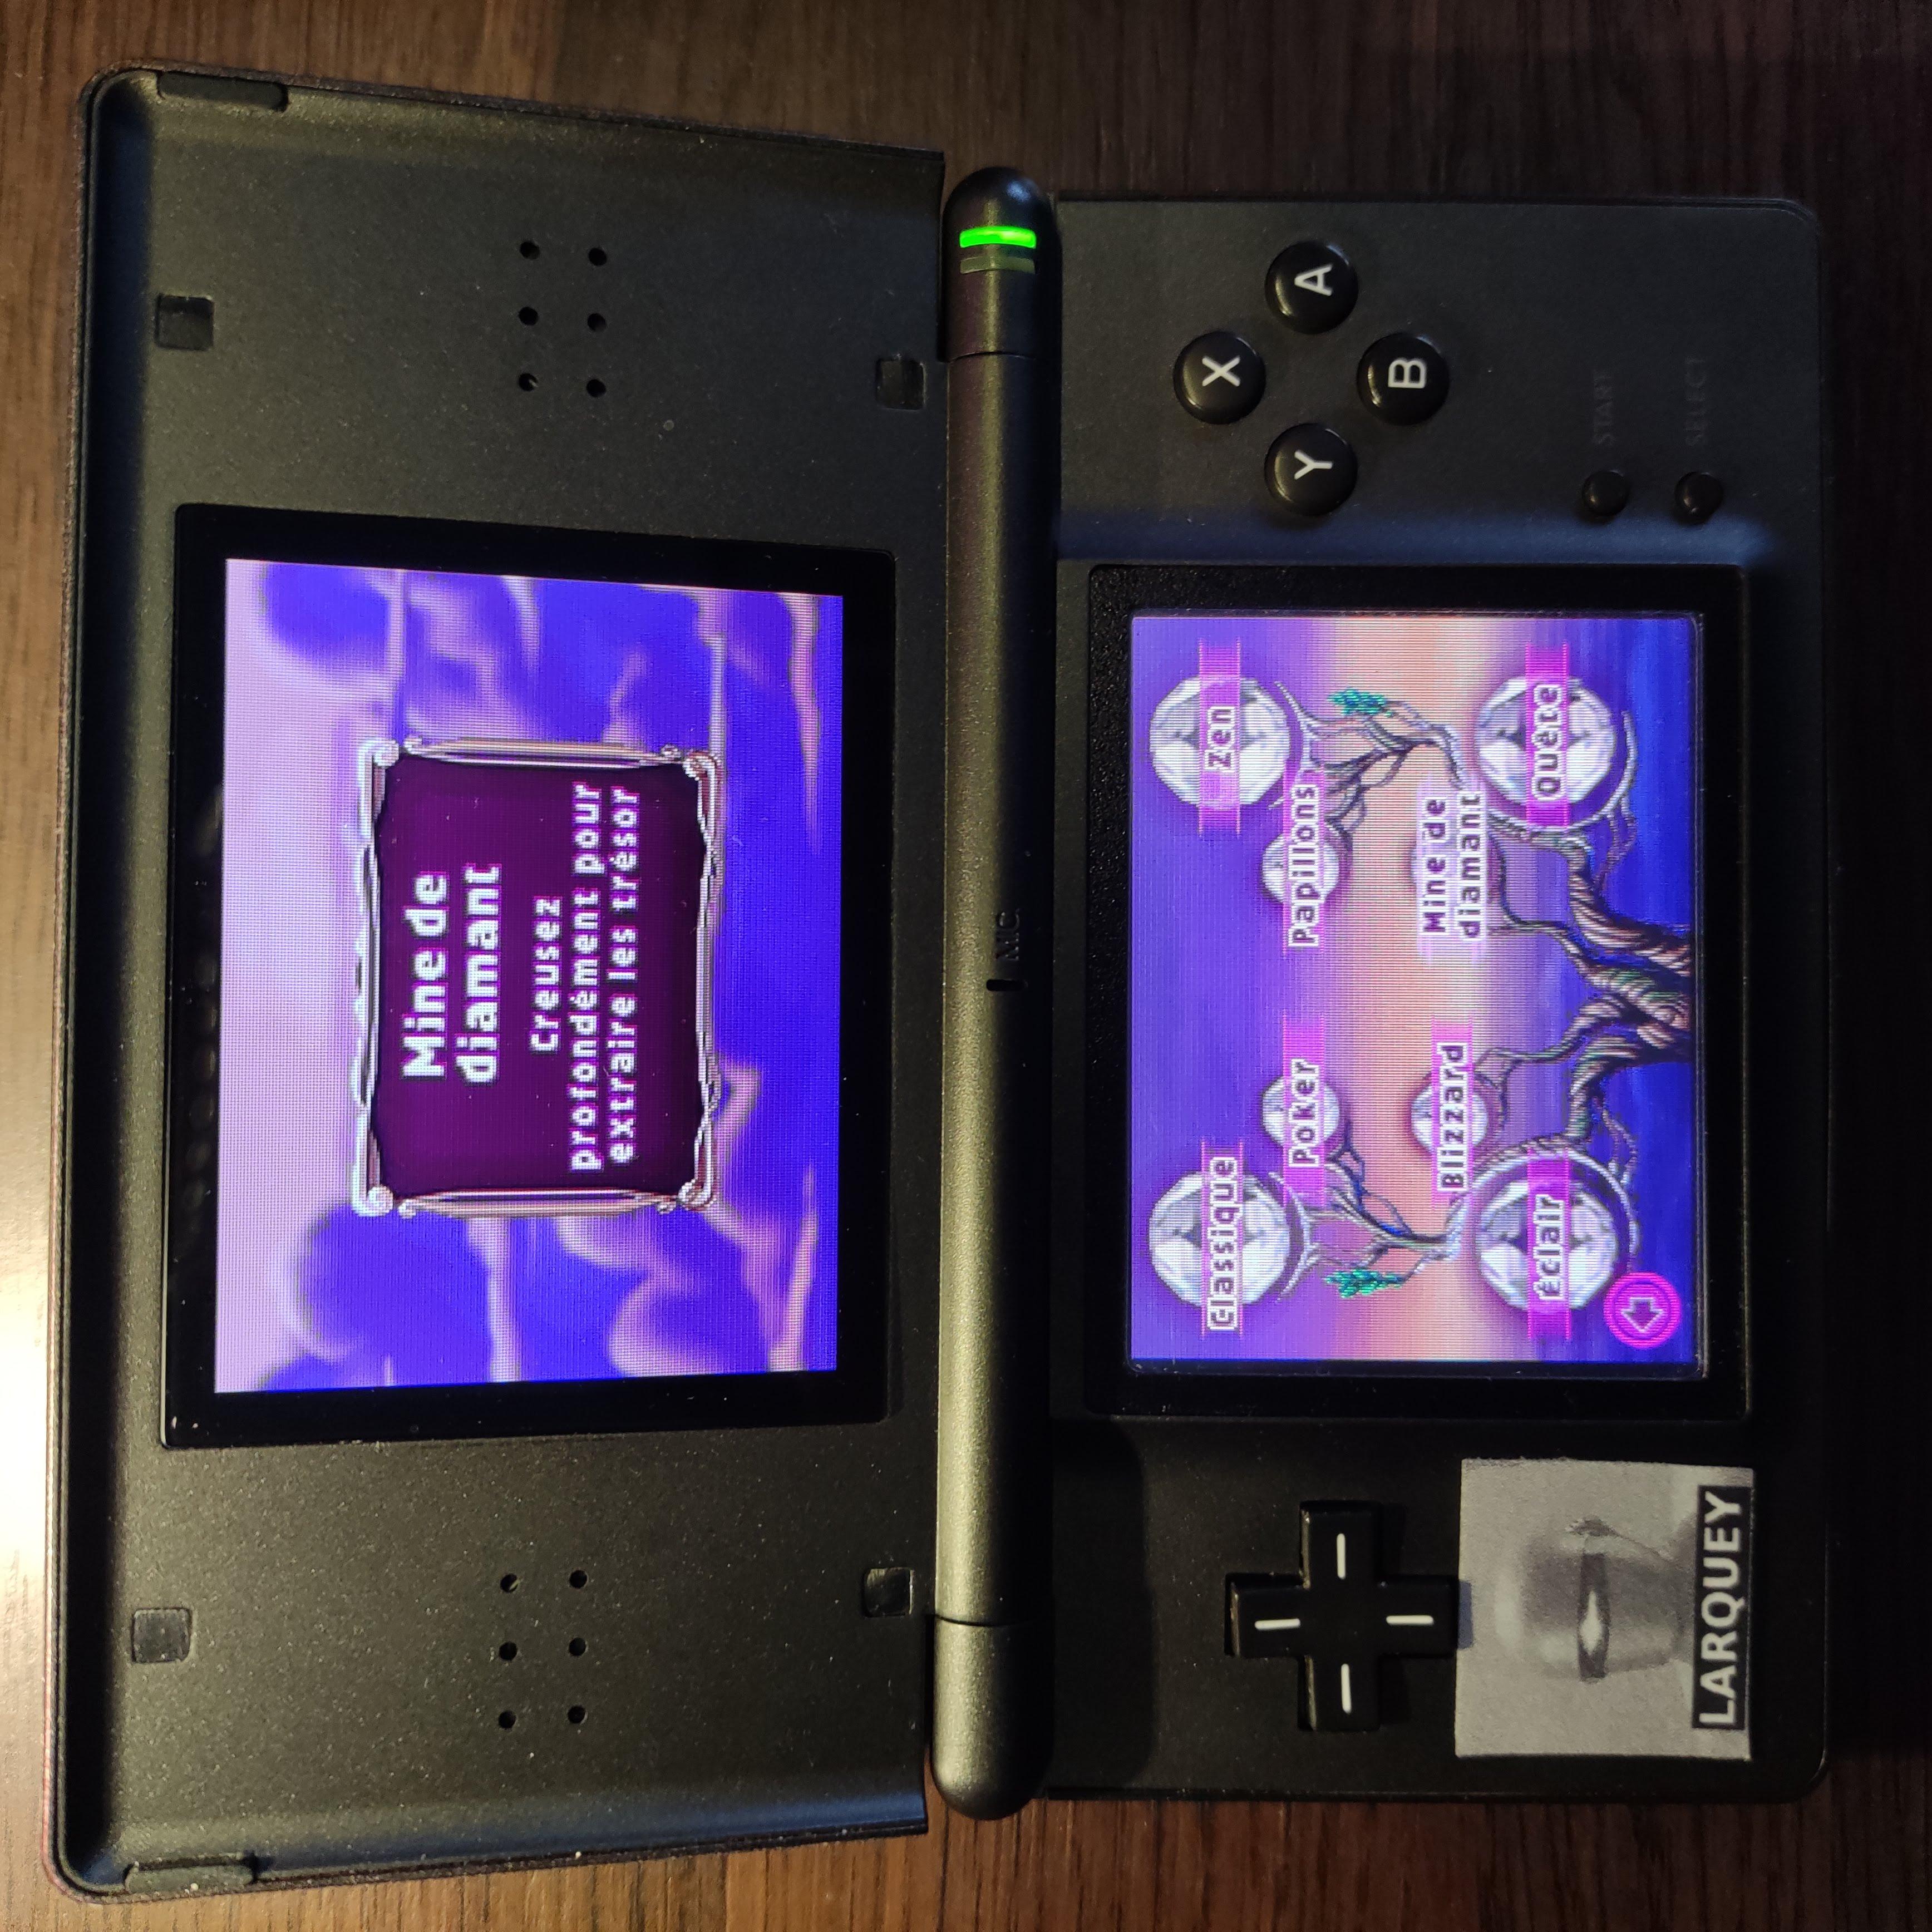 Larquey: Bejeweled 3: Diamond Mine [Best Move] (Nintendo DS) 24,000 points on 2020-09-27 12:46:59